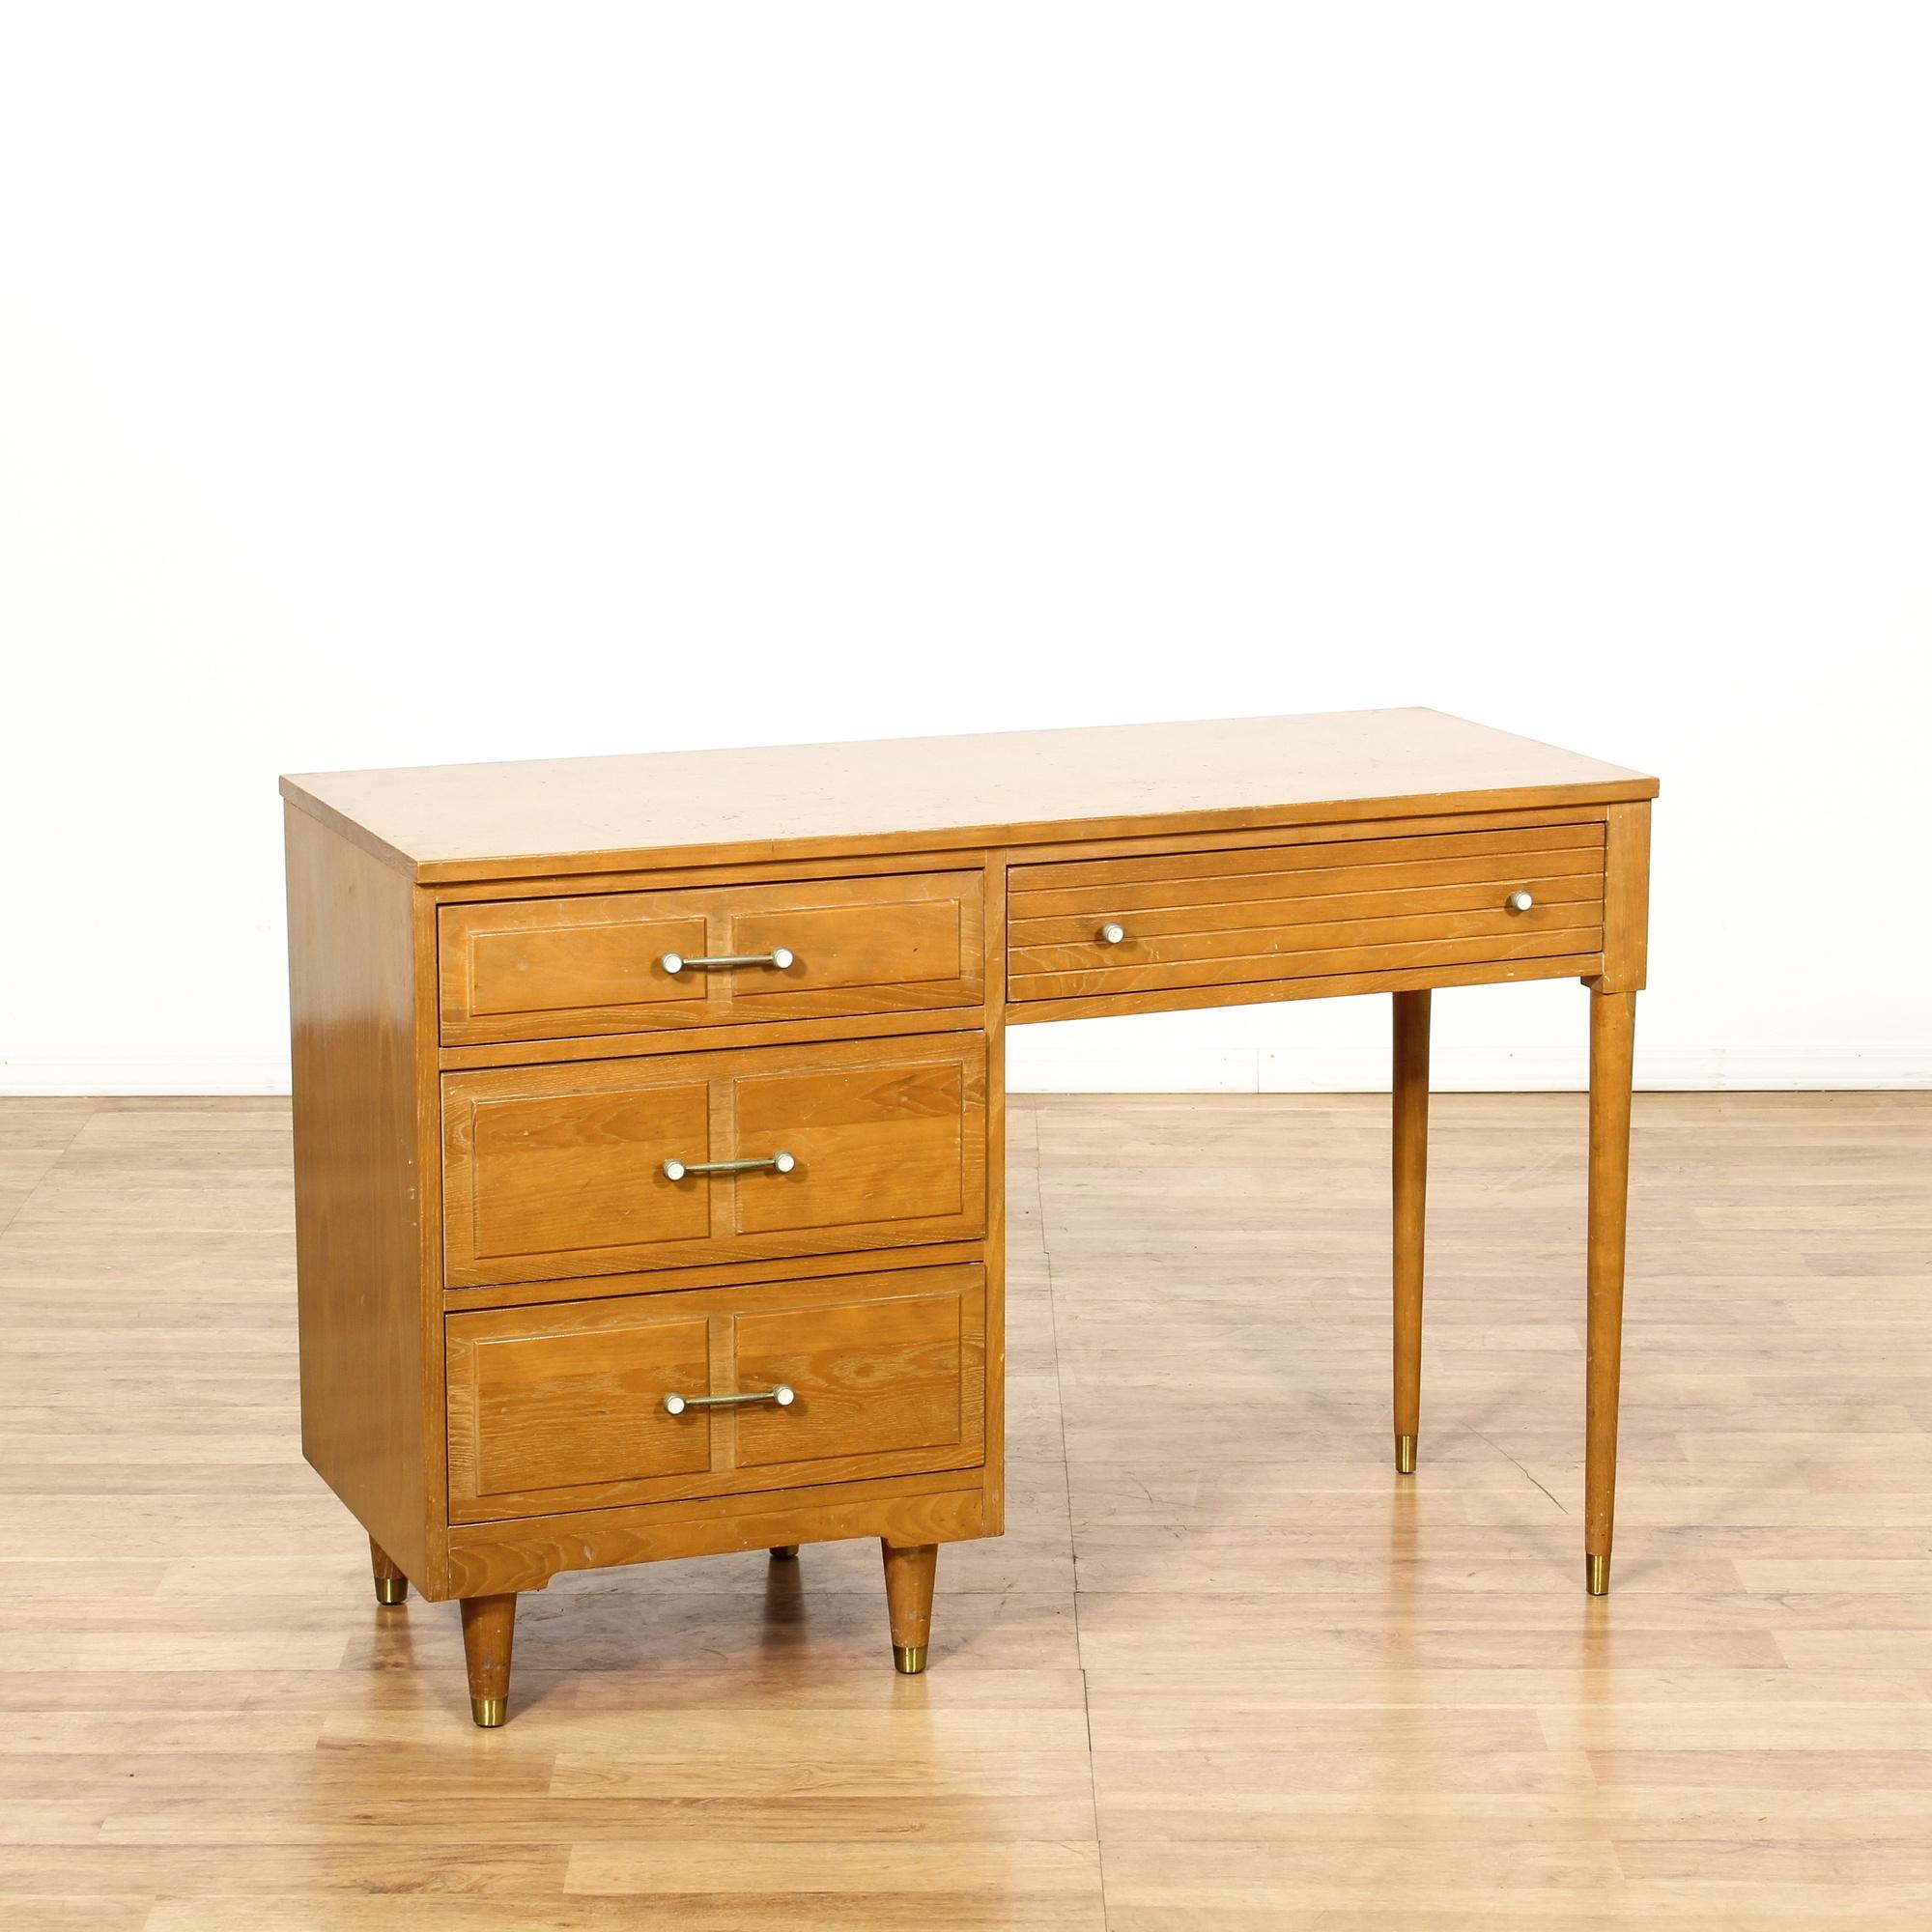 Mid century modern ash kneehole desk loveseat vintage for Mid century furniture san francisco